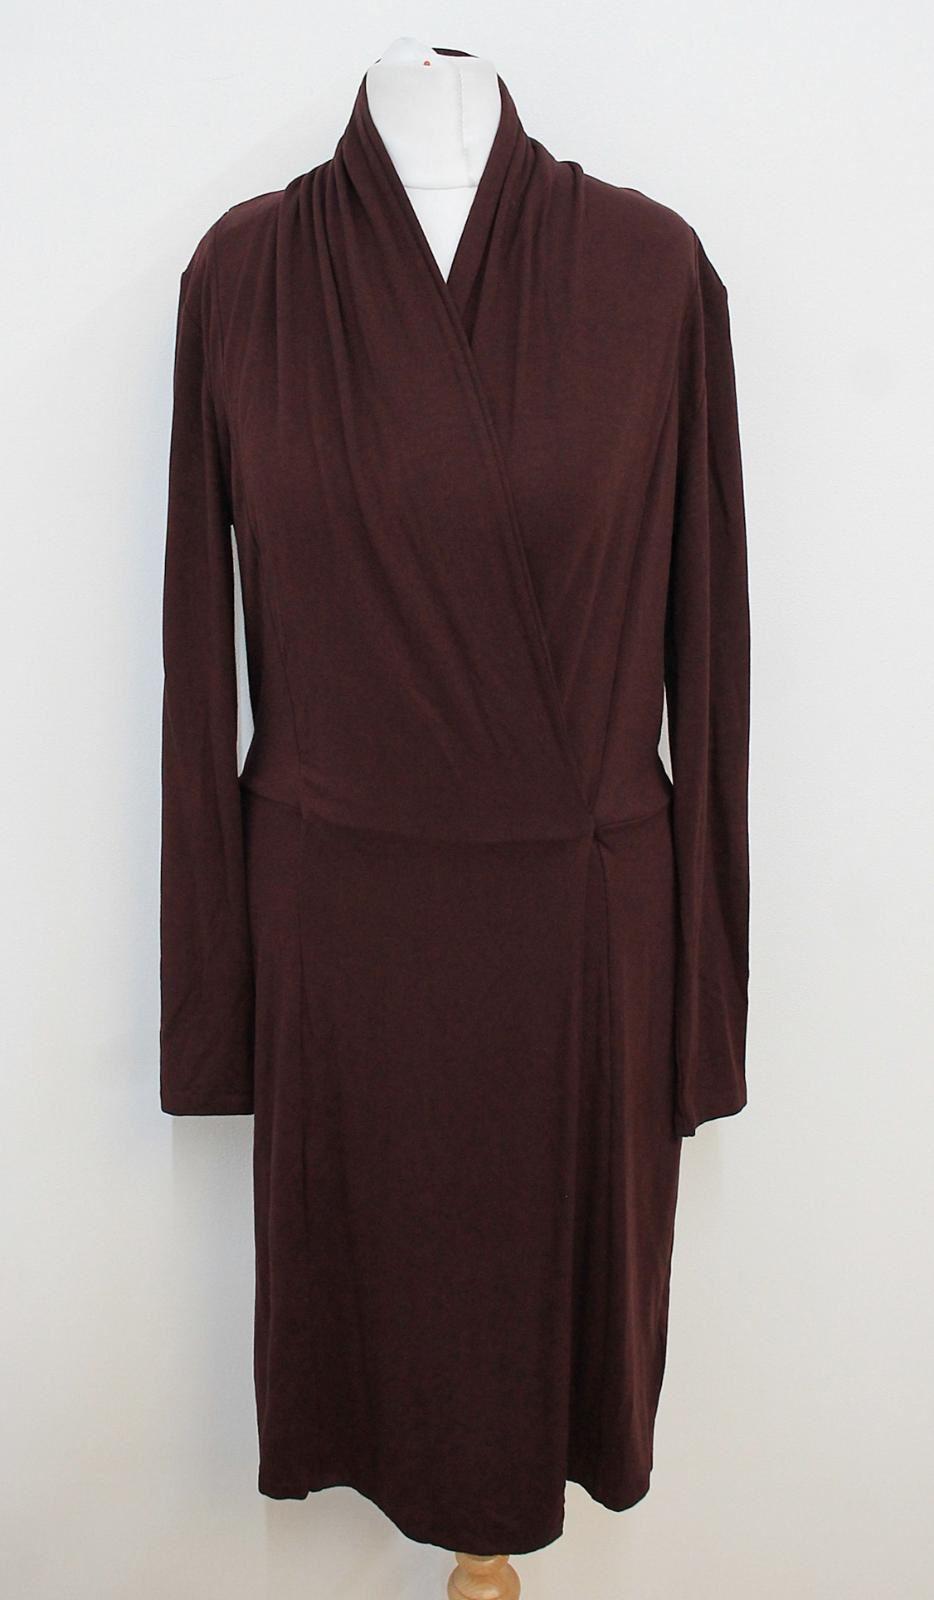 FARHI-NICOLE-FARHI-Ladies-Burgundy-Red-V-Neckline-Long-Sleeved-Shift-Dress-S